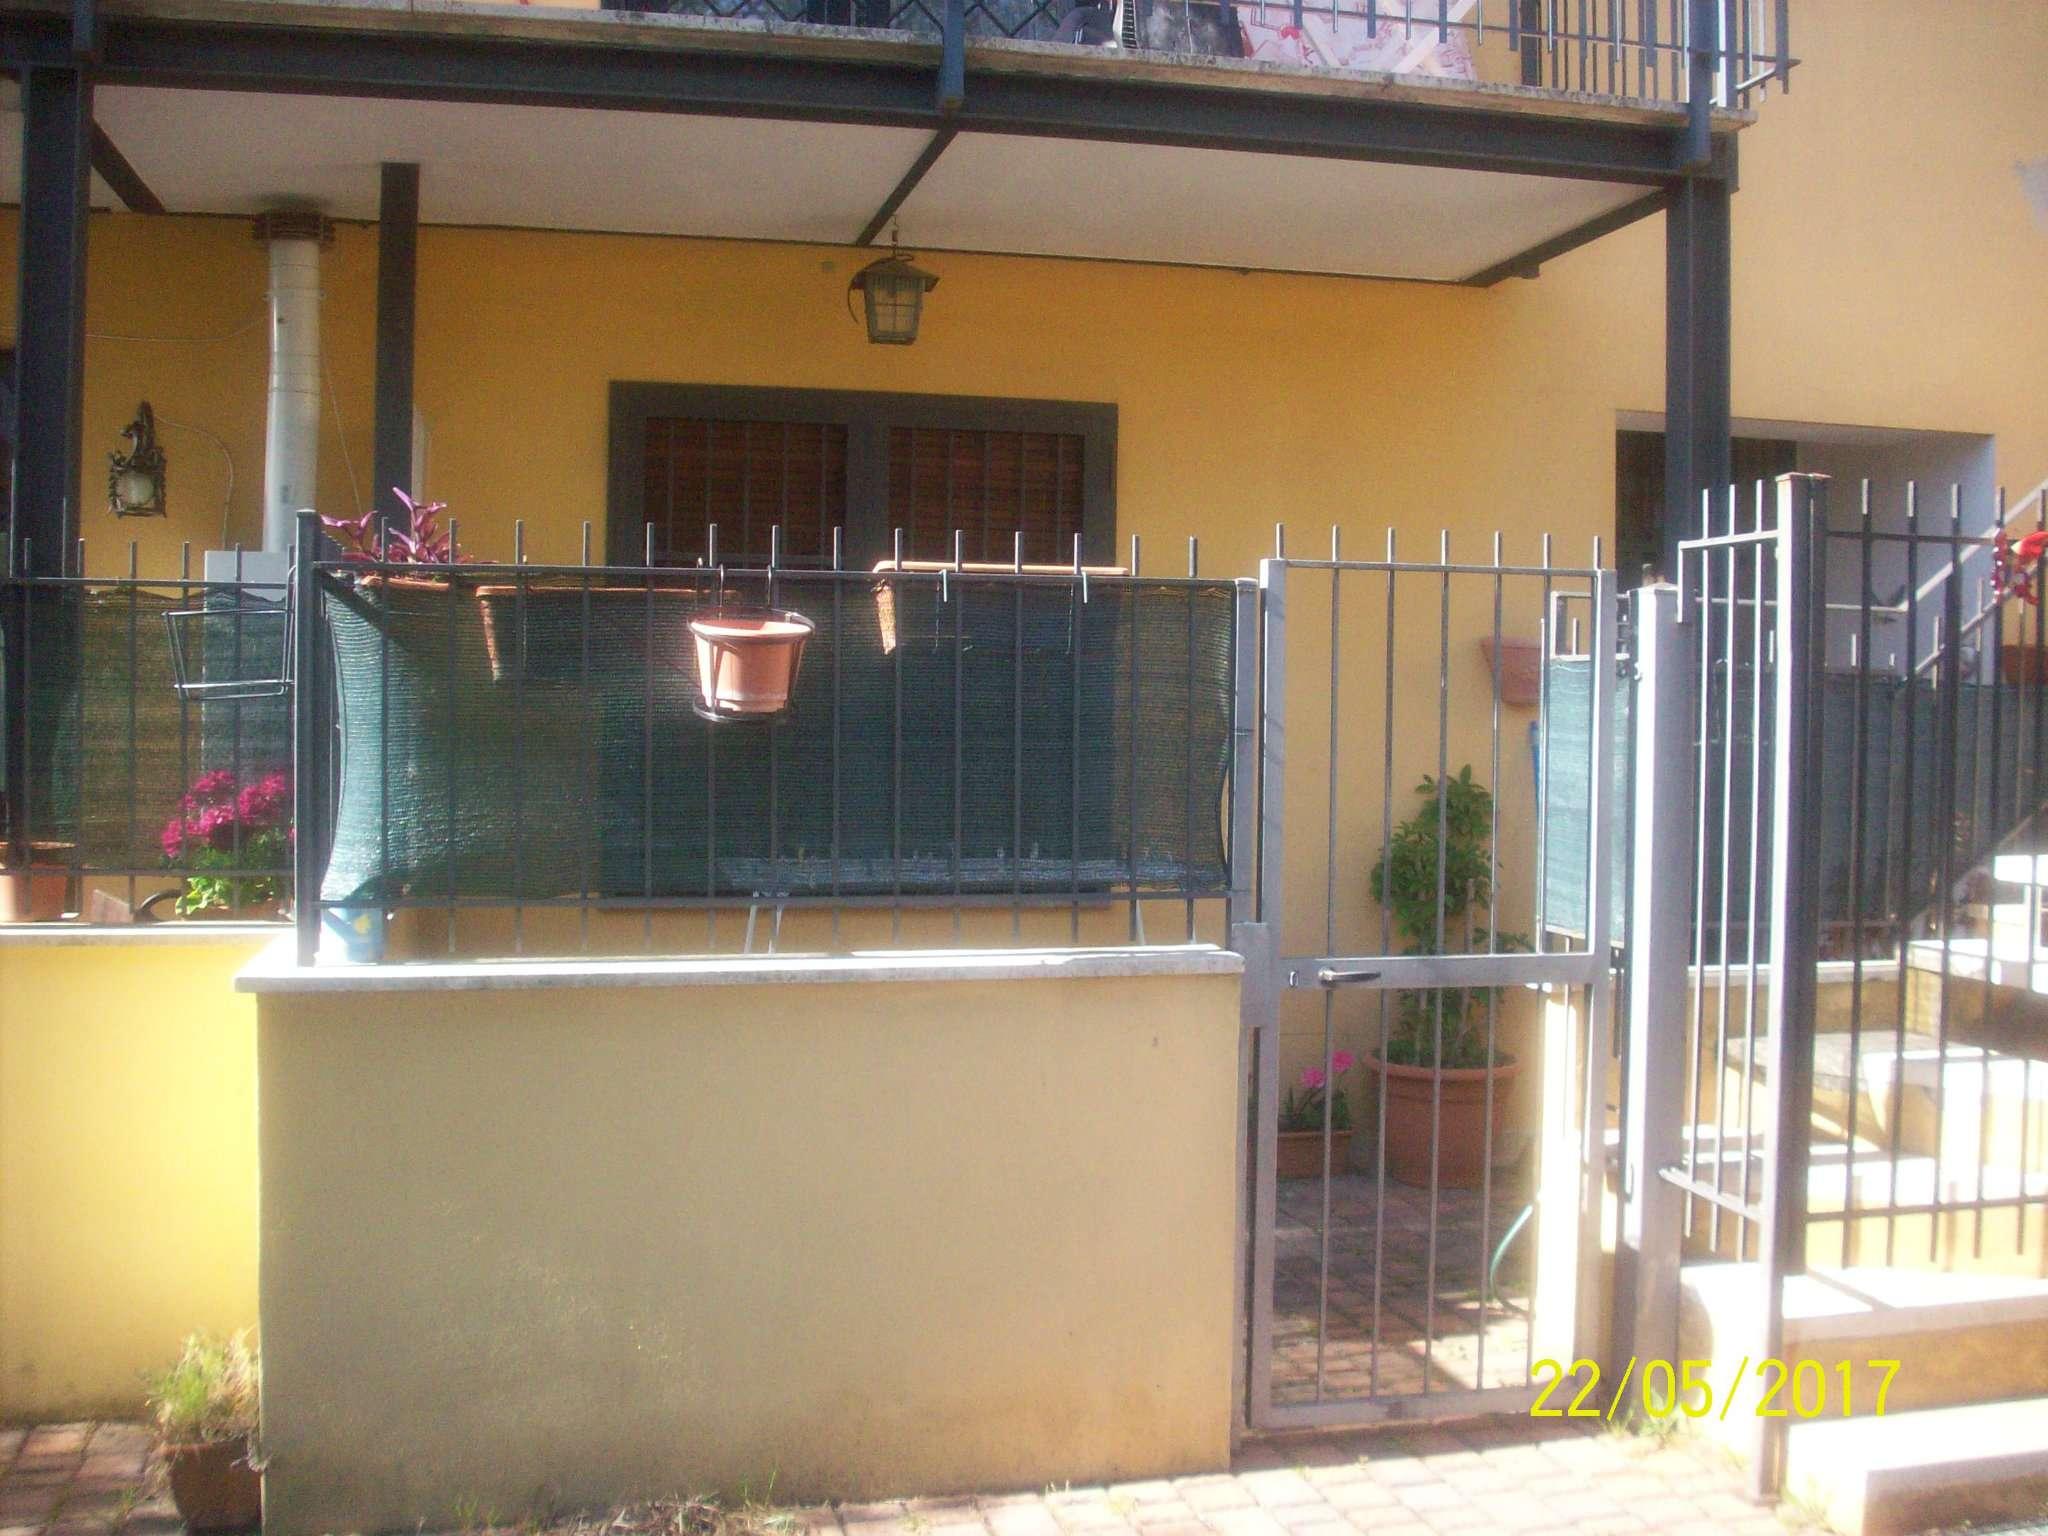 ariccia zona alta residenziale affittasi appartamento arred entr. indip. con posto auto esterno